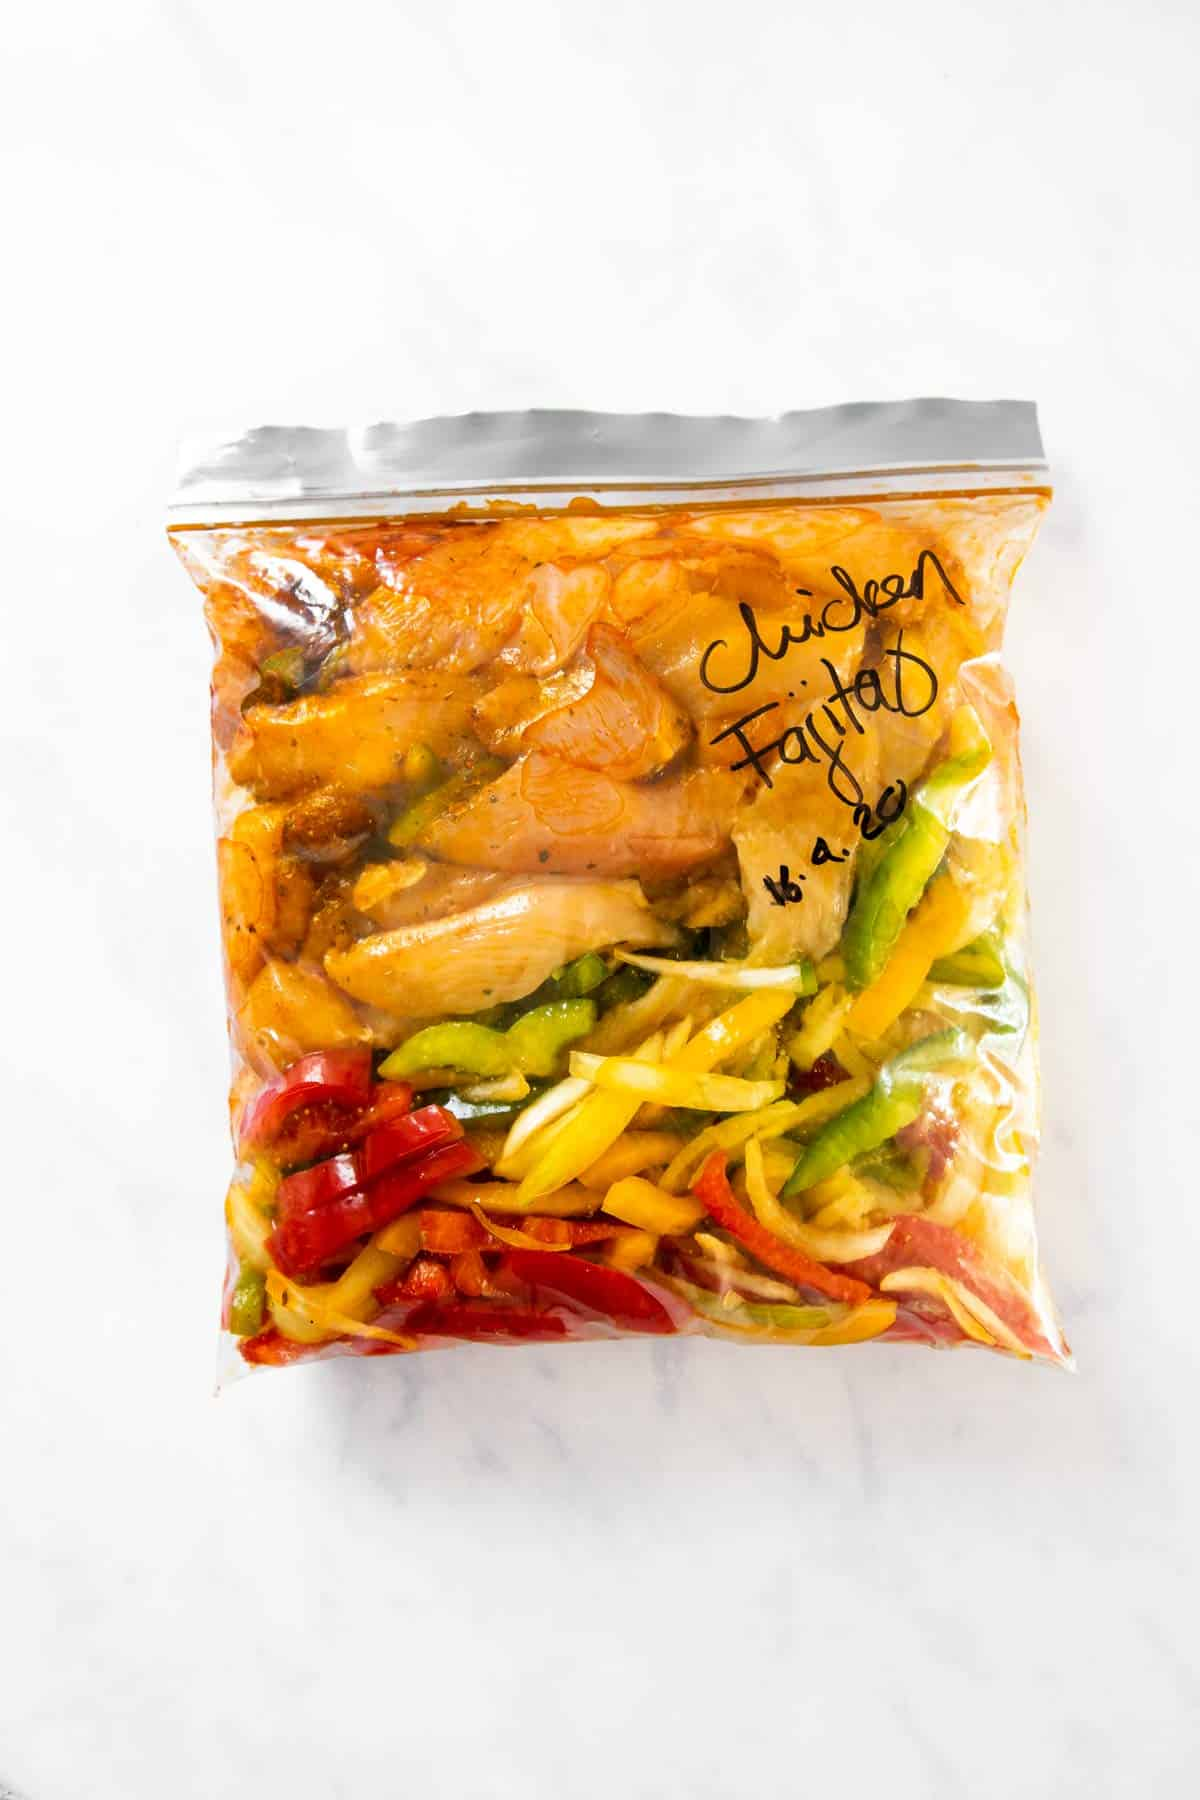 freezer bag filled with ingredients for chicken fajitas